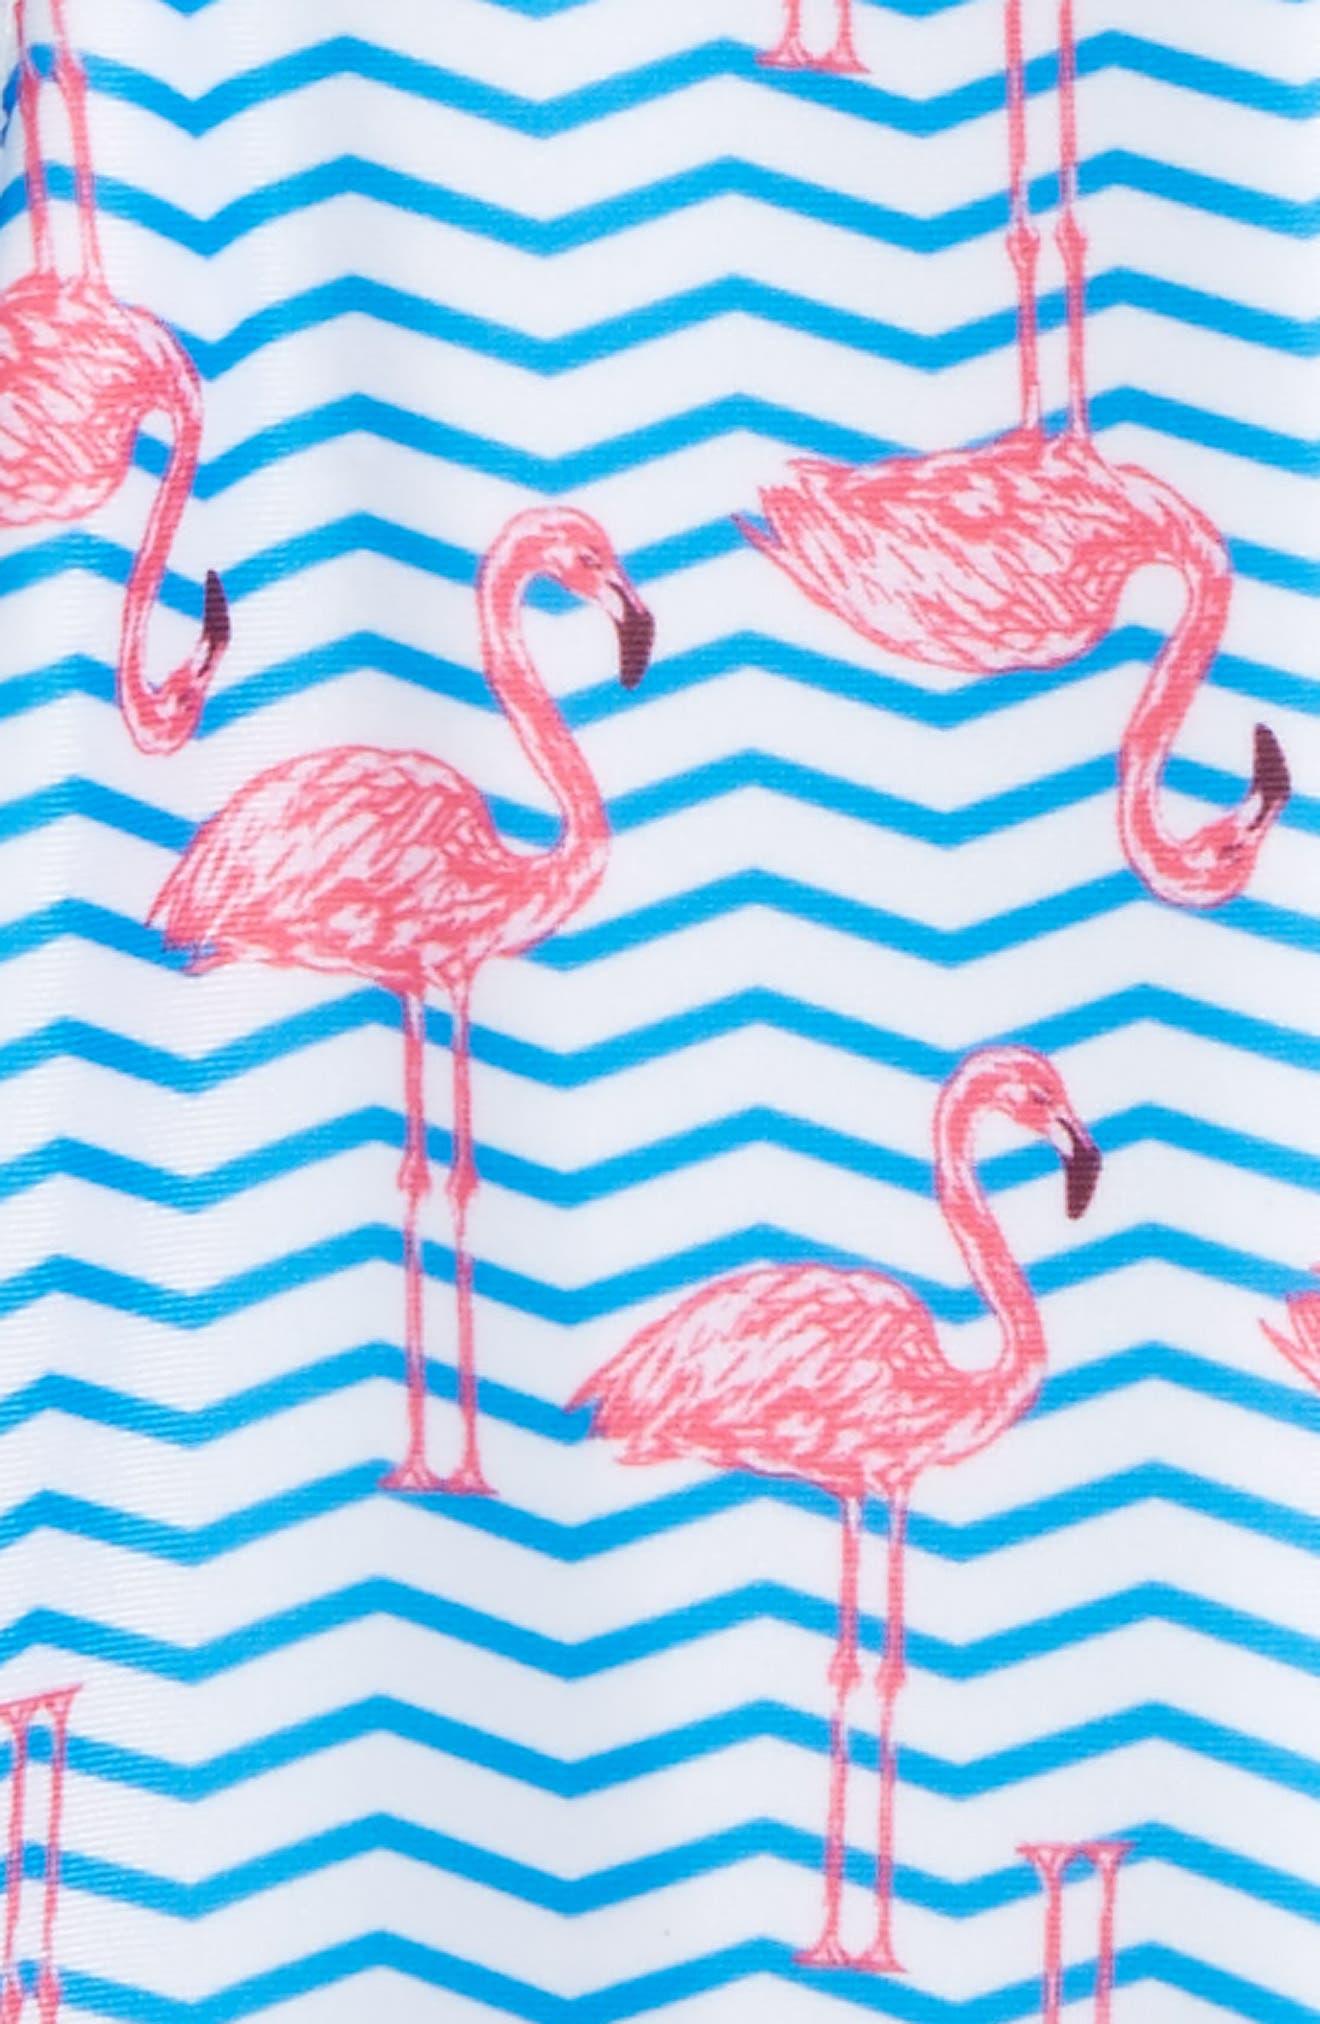 Zigzag Flamingos One-Piece Rashguard Swimsuit,                             Alternate thumbnail 2, color,                             Blue Multi